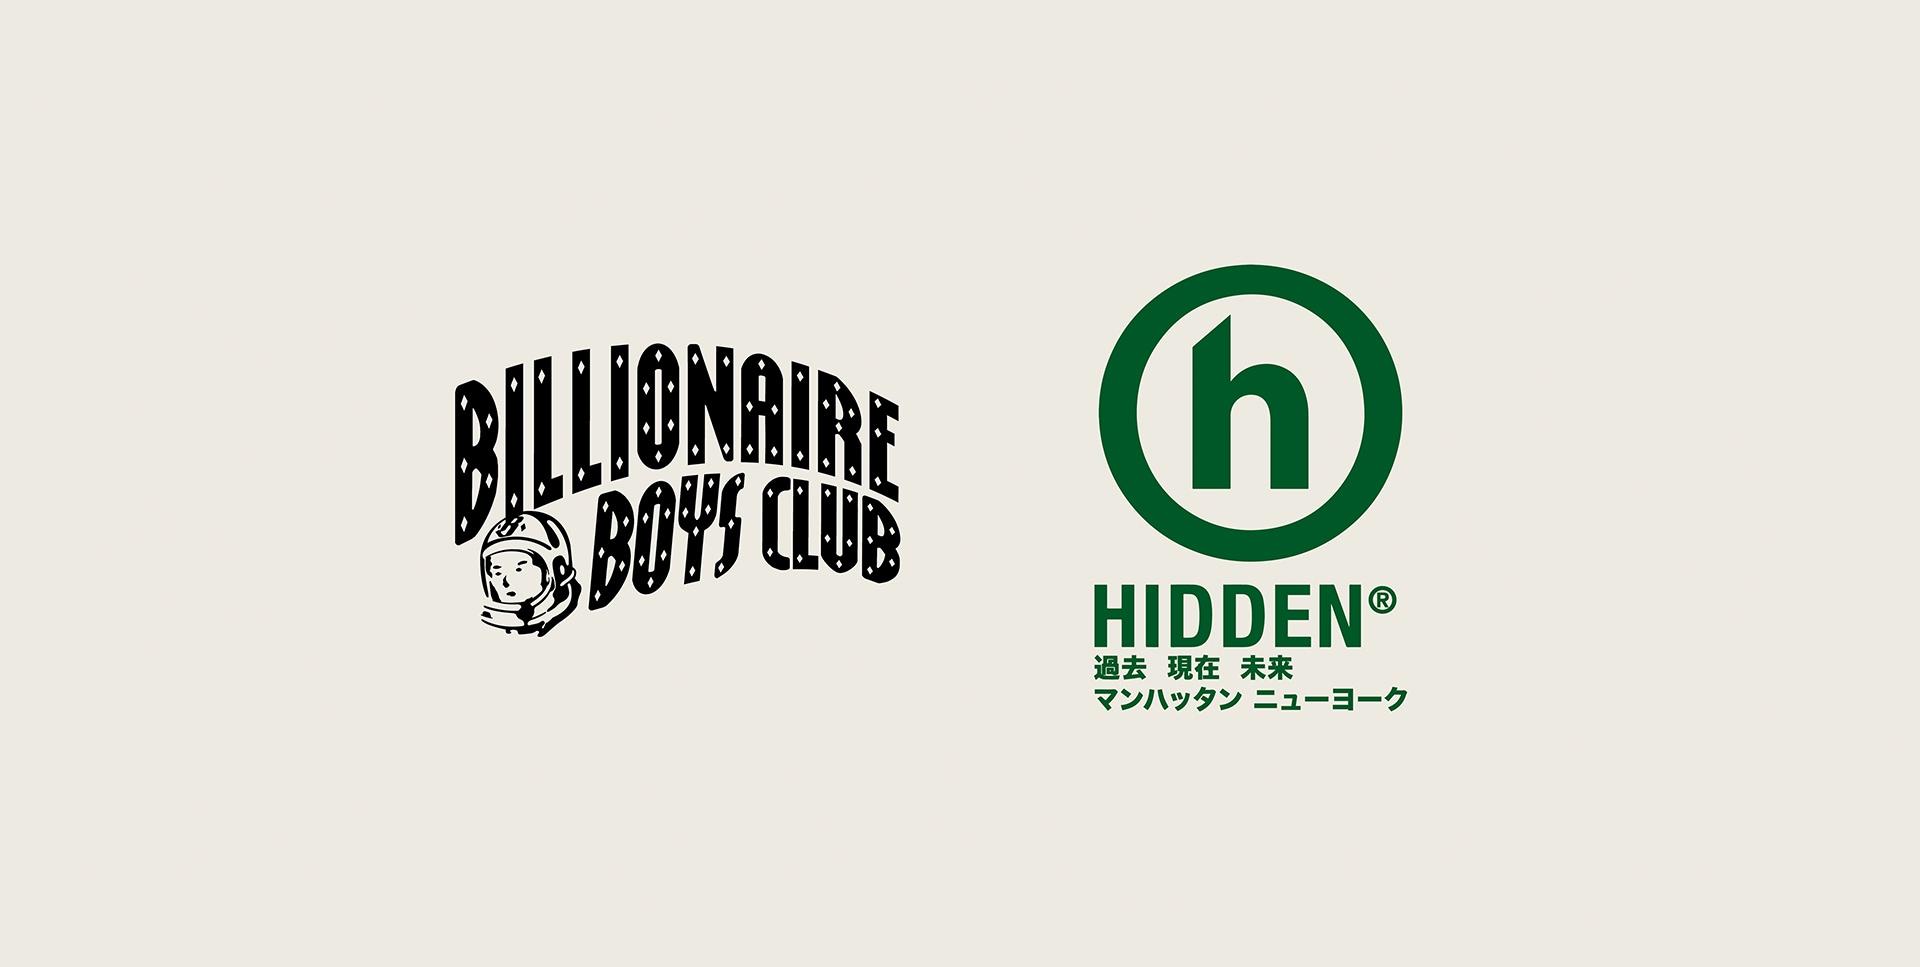 BILLIONAIRE BOYS CLUB x HIDDEN